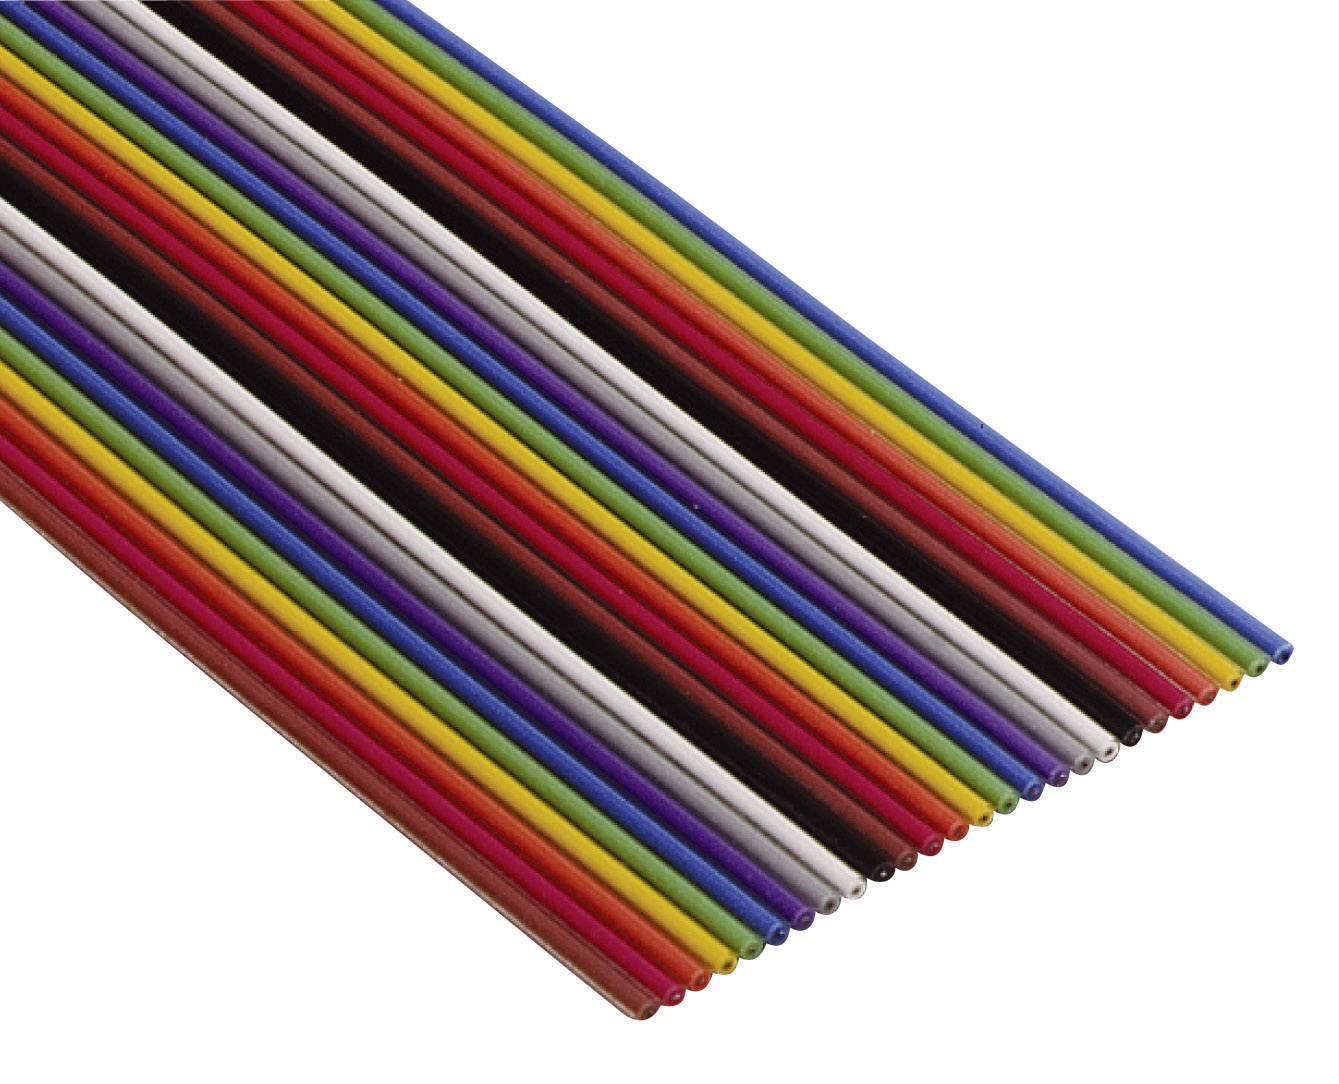 Plochý kabel 3M 3M-3302-16 SF (80610790265), nestíněný, 1 m